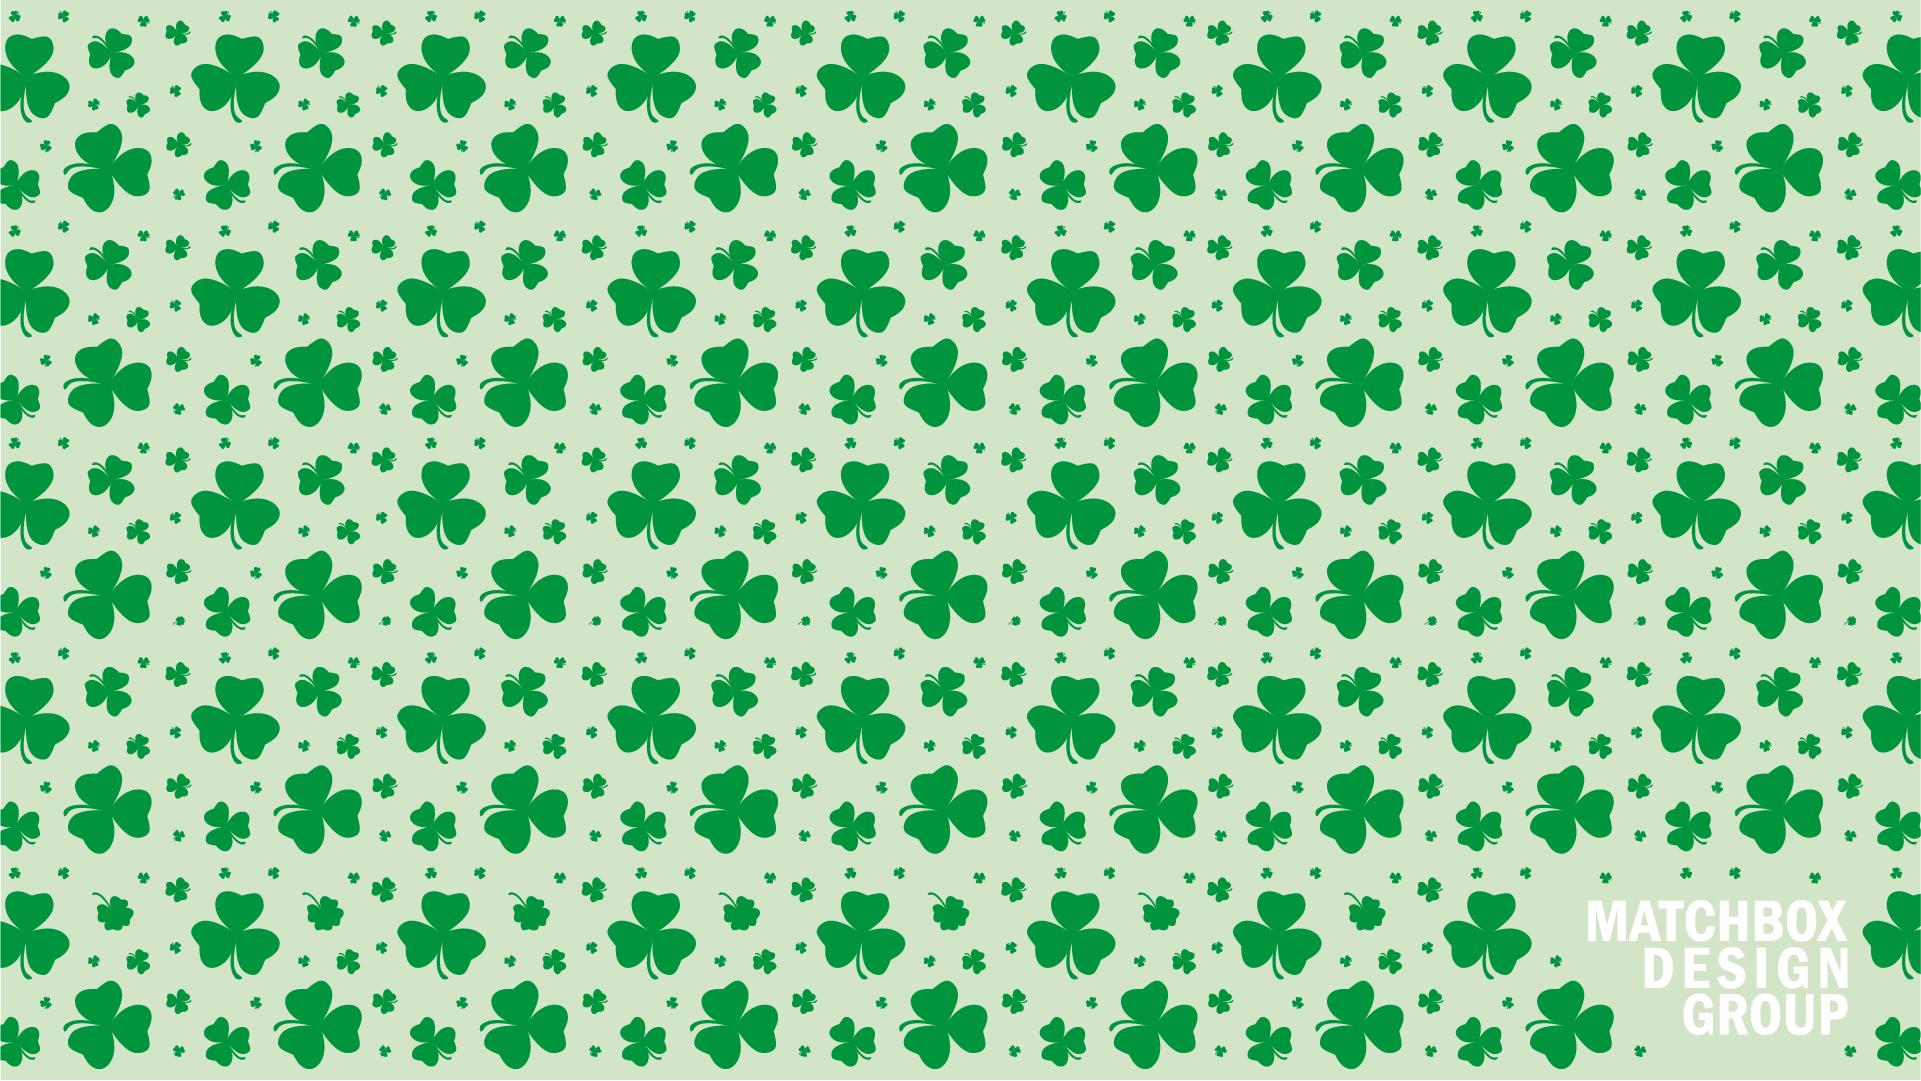 St Patricks Day Wallpaper Matchbox Design Group St Louis MO 1921x1081